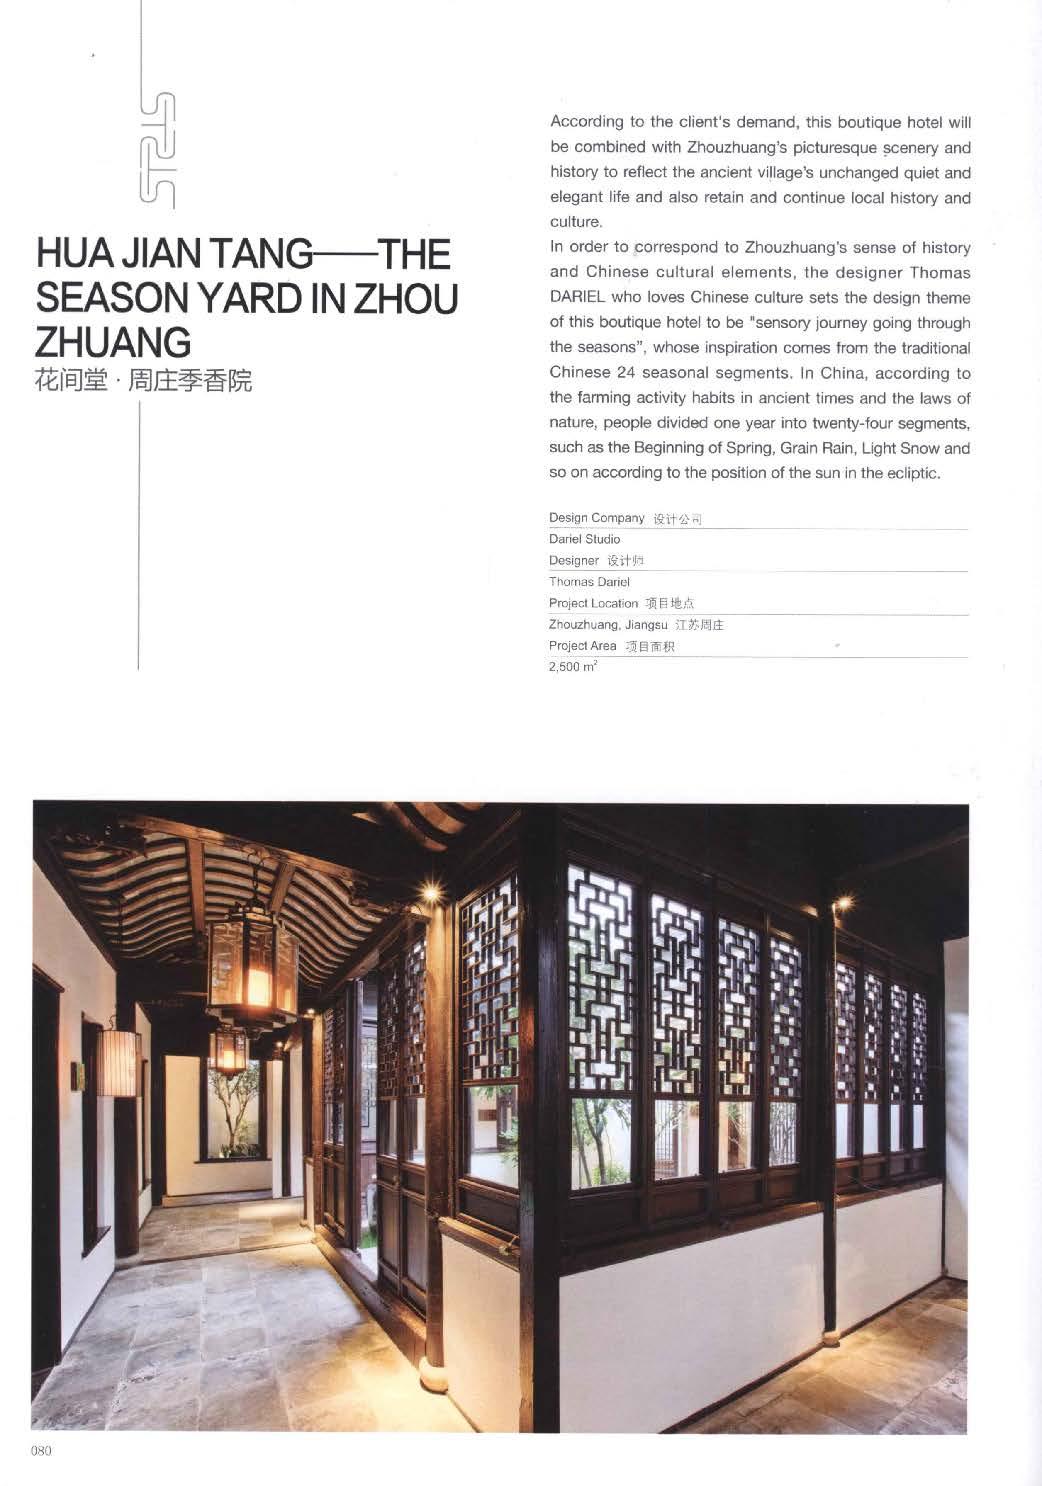 H073 东方风情 会所、餐饮细部解析_Page_078.jpg